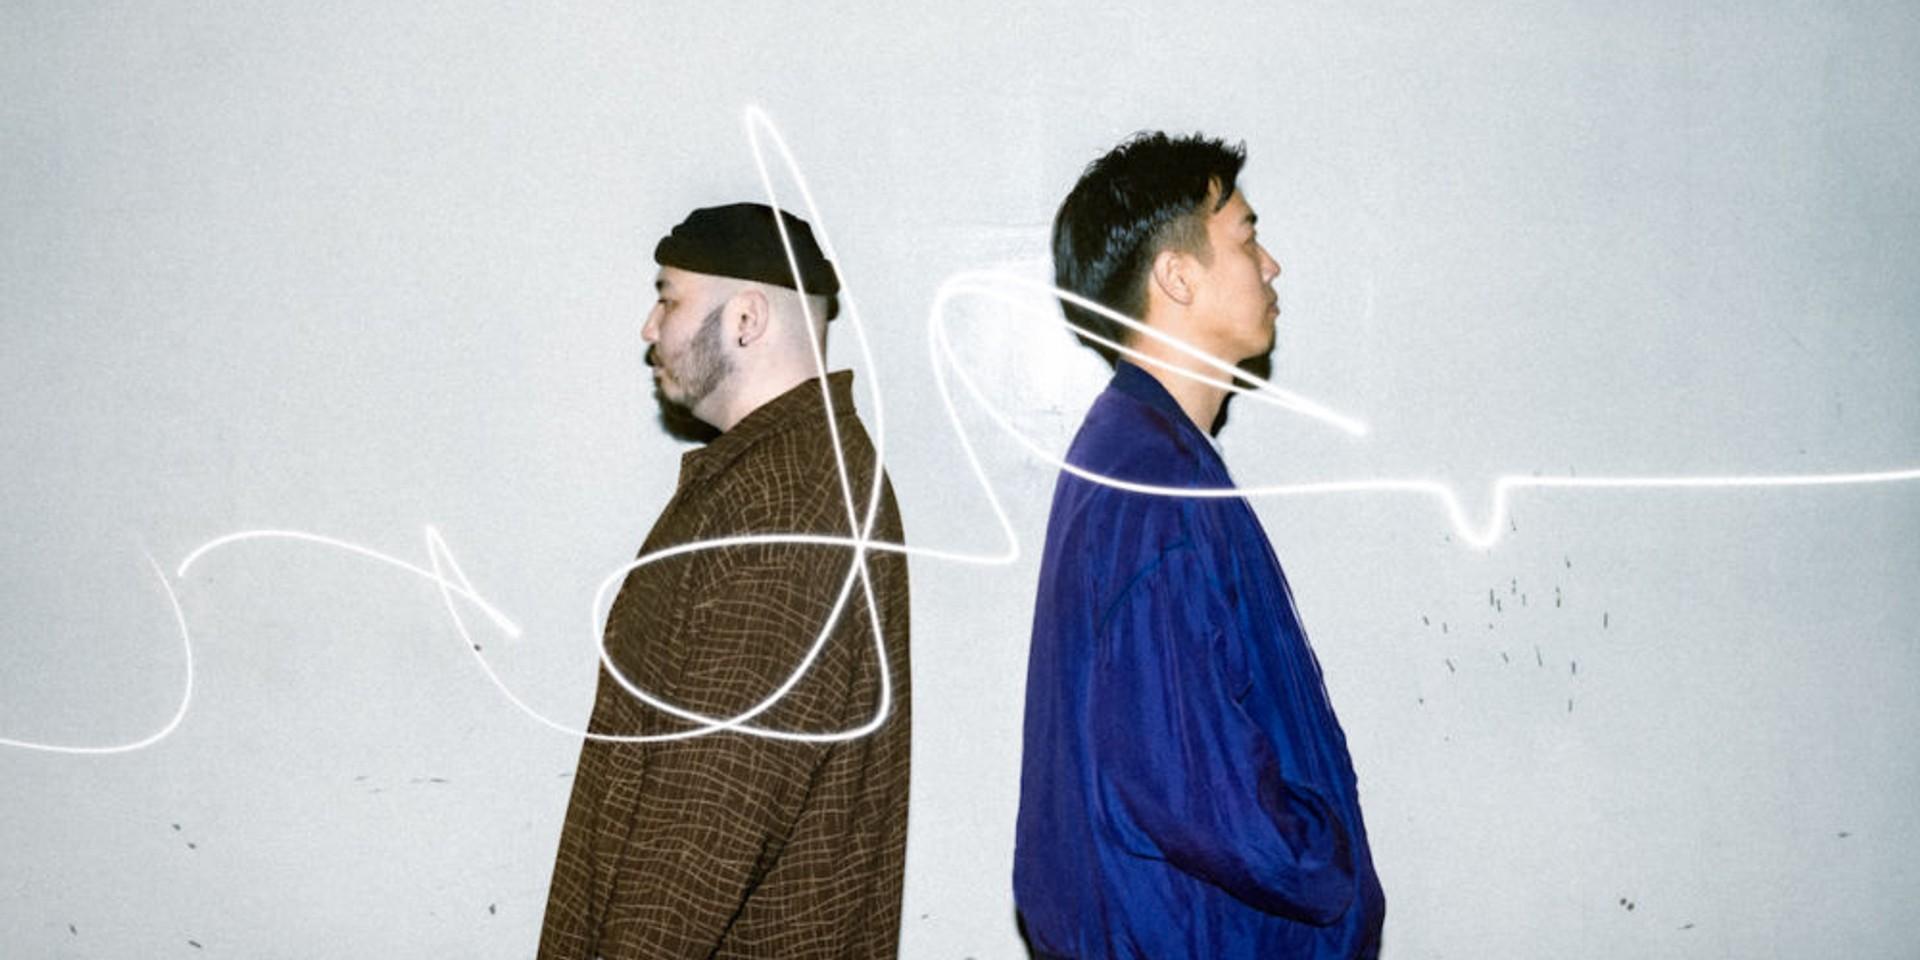 sankara team up with HYUKOH and DJ Namo for new collaborative single 'Louder' – listen